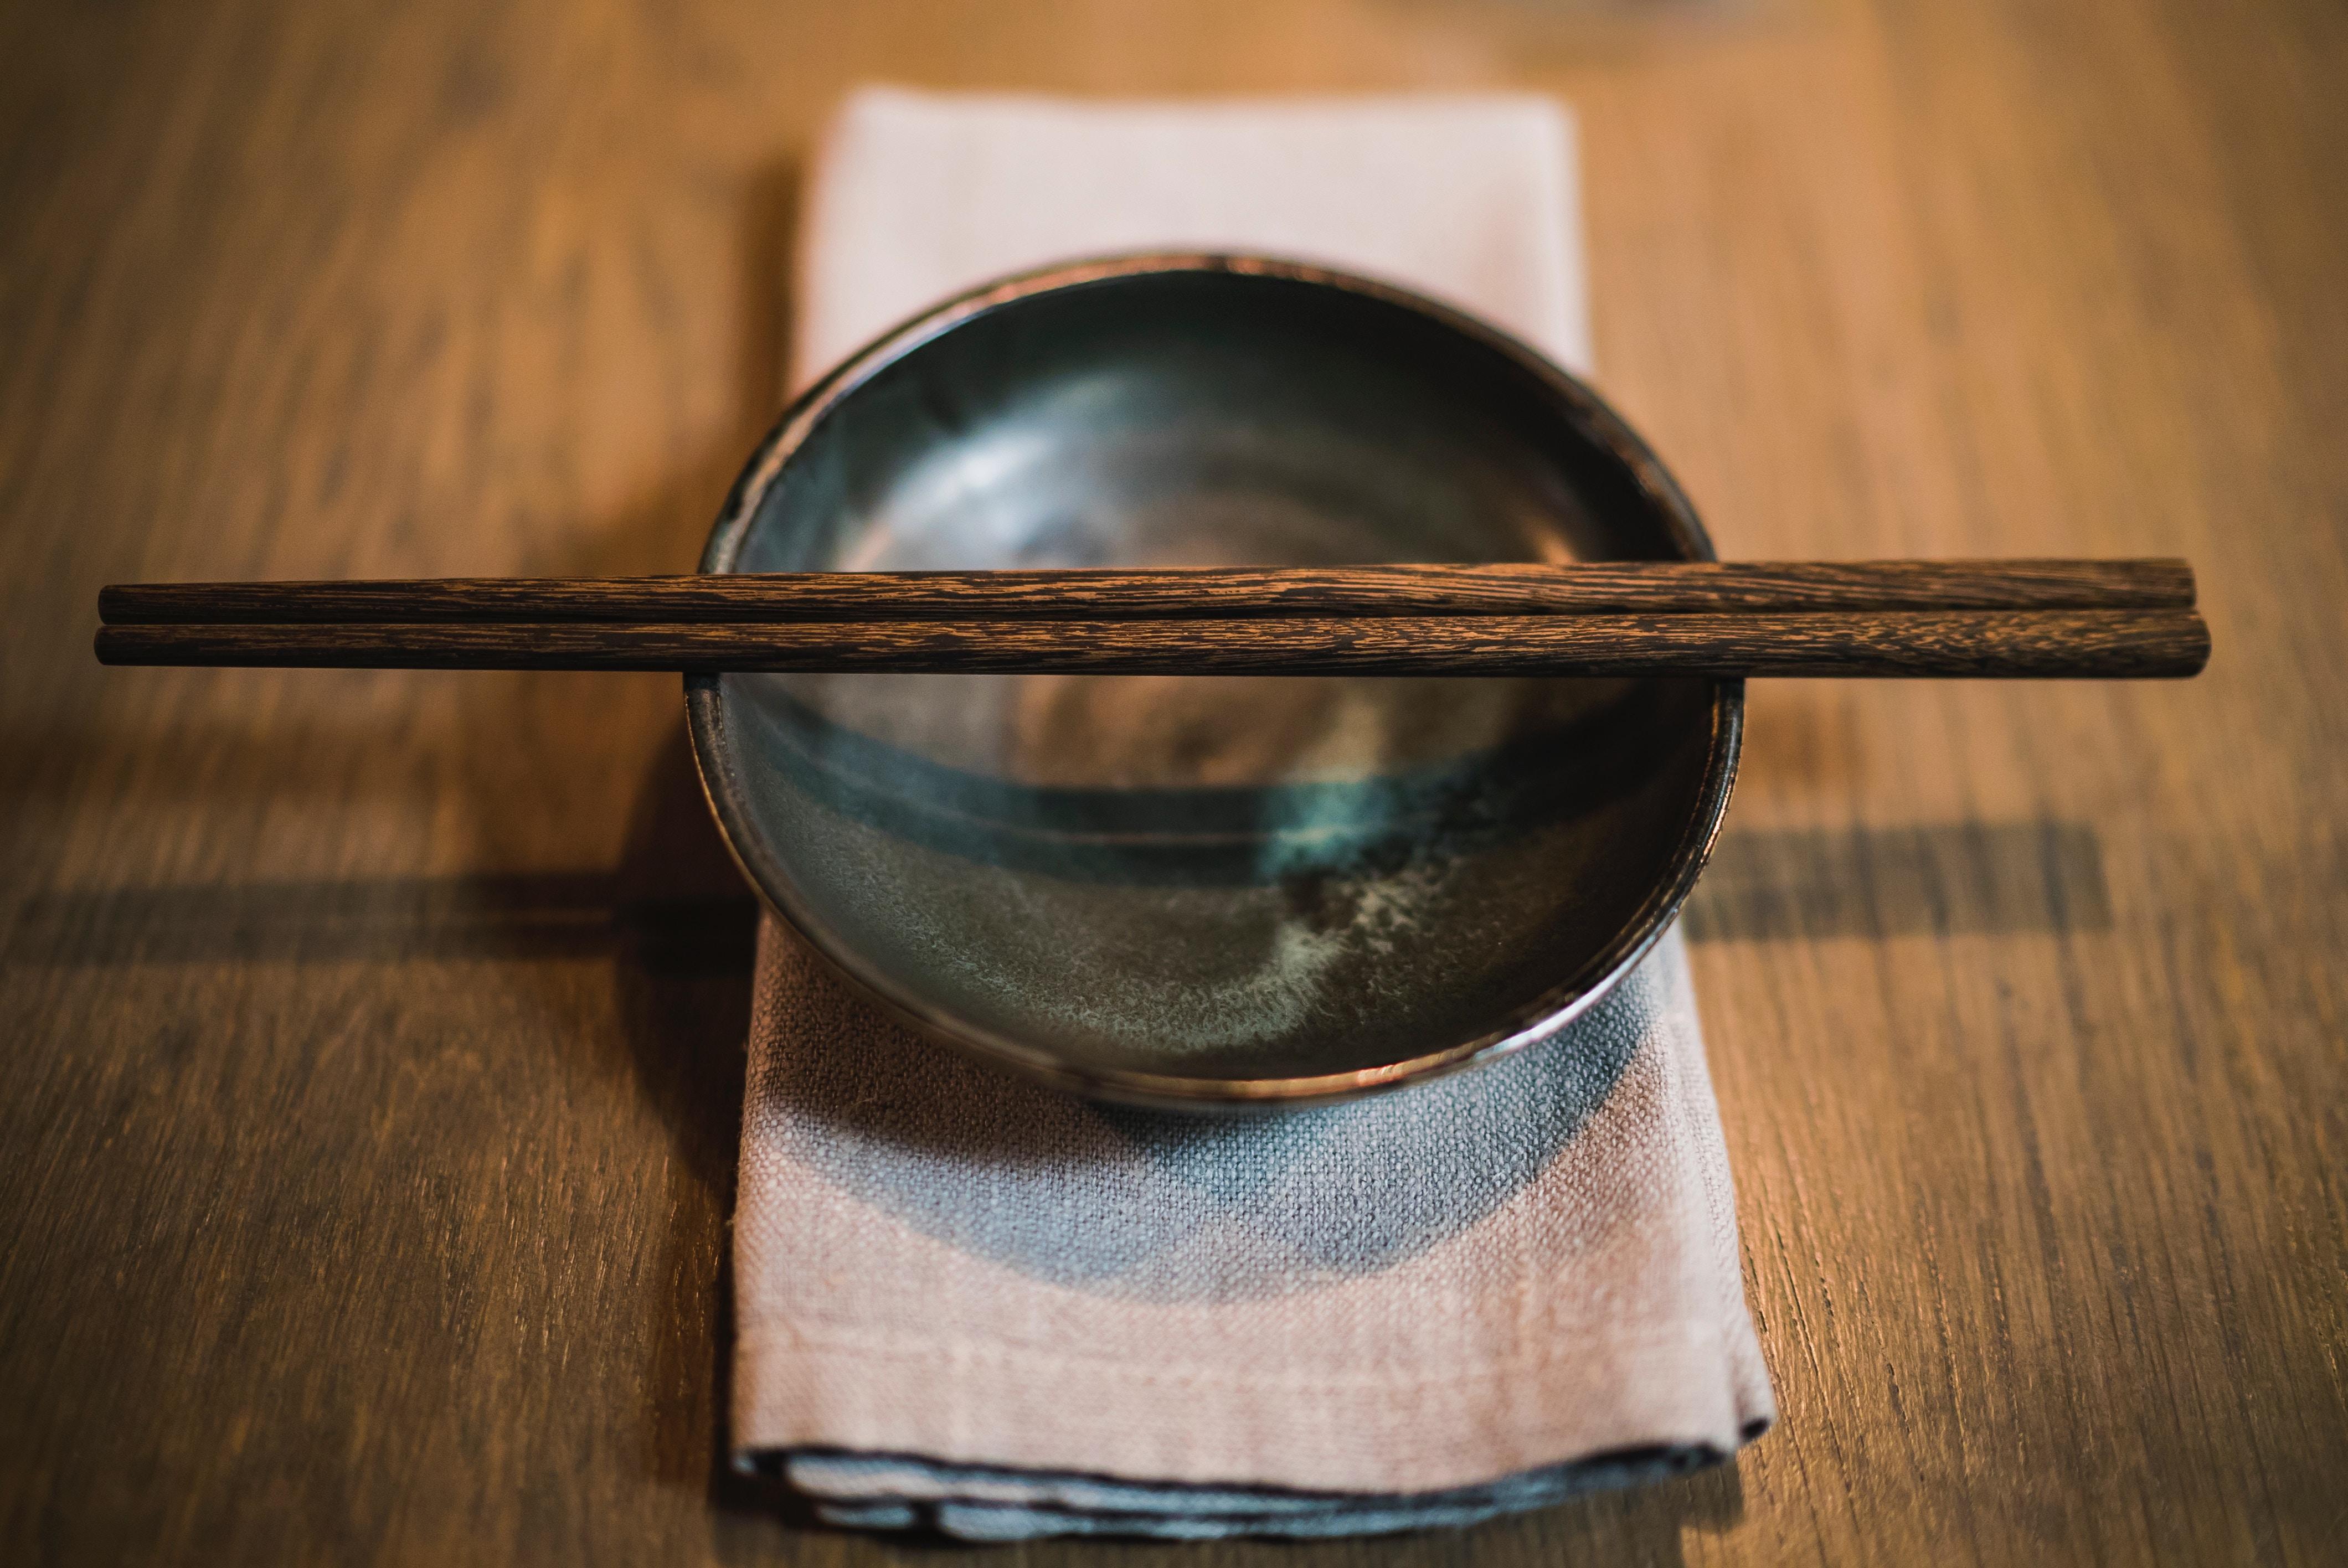 Chopsticks o palillos japoneses. Tradition